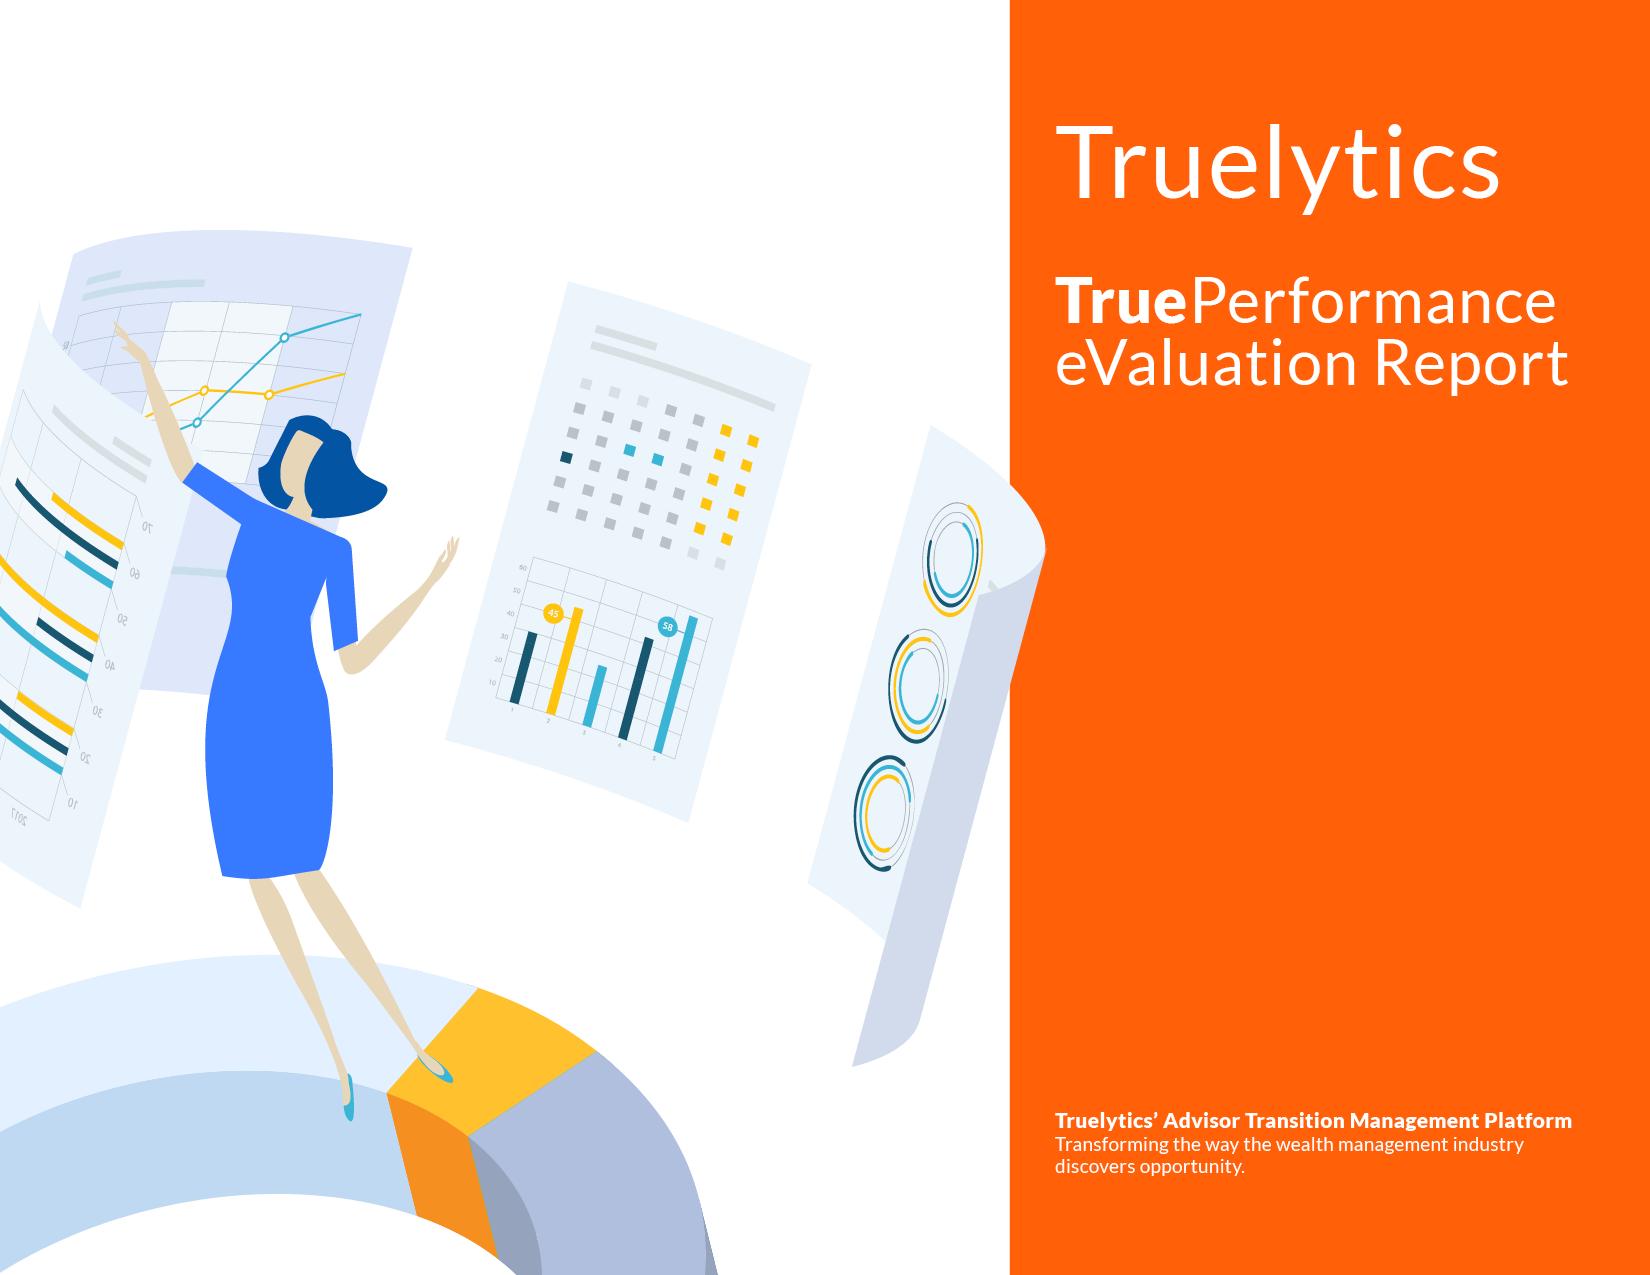 Truelytics-eValuation-Report-V2f